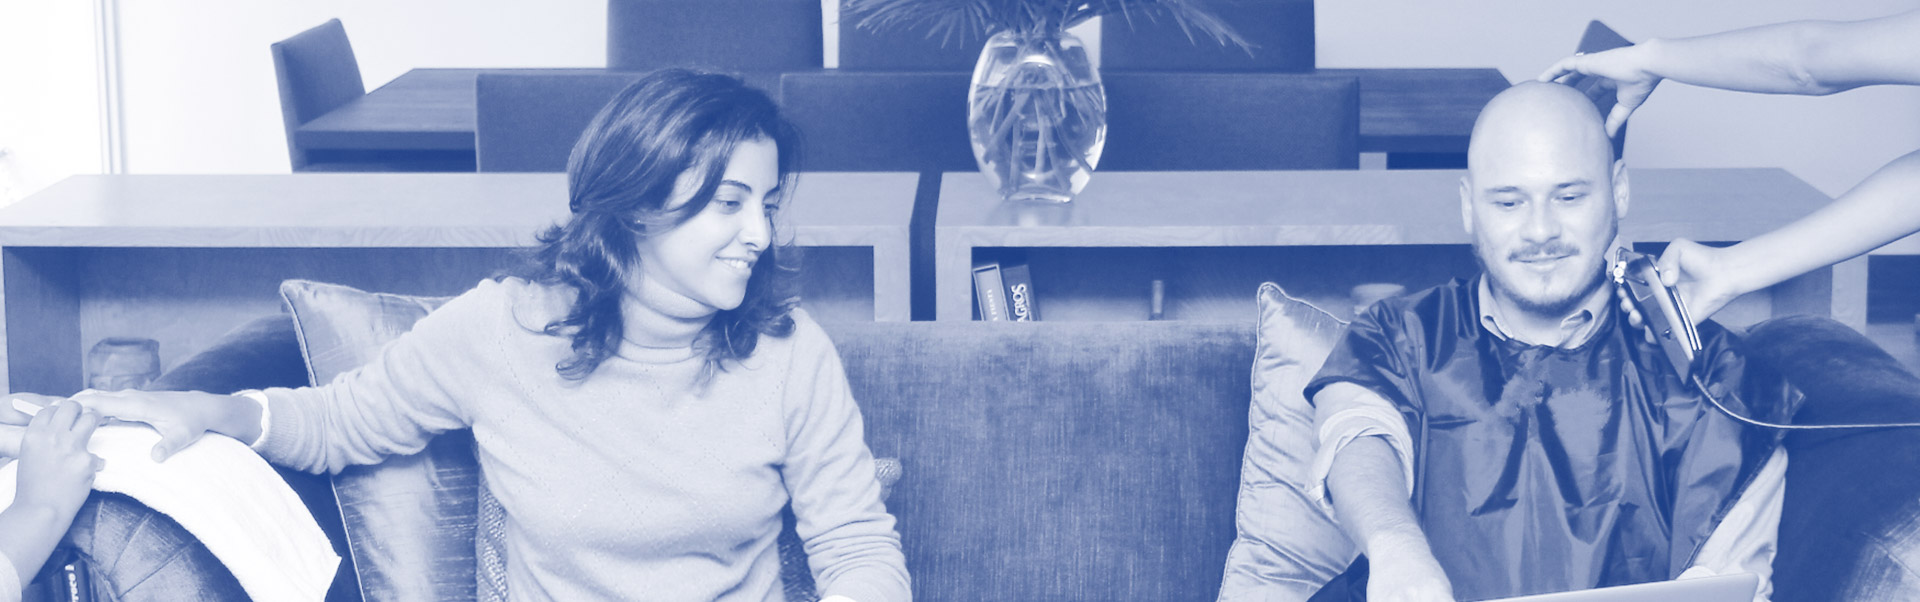 "INSTANT SALON: El salón de belleza a un ""click"" de distancia"